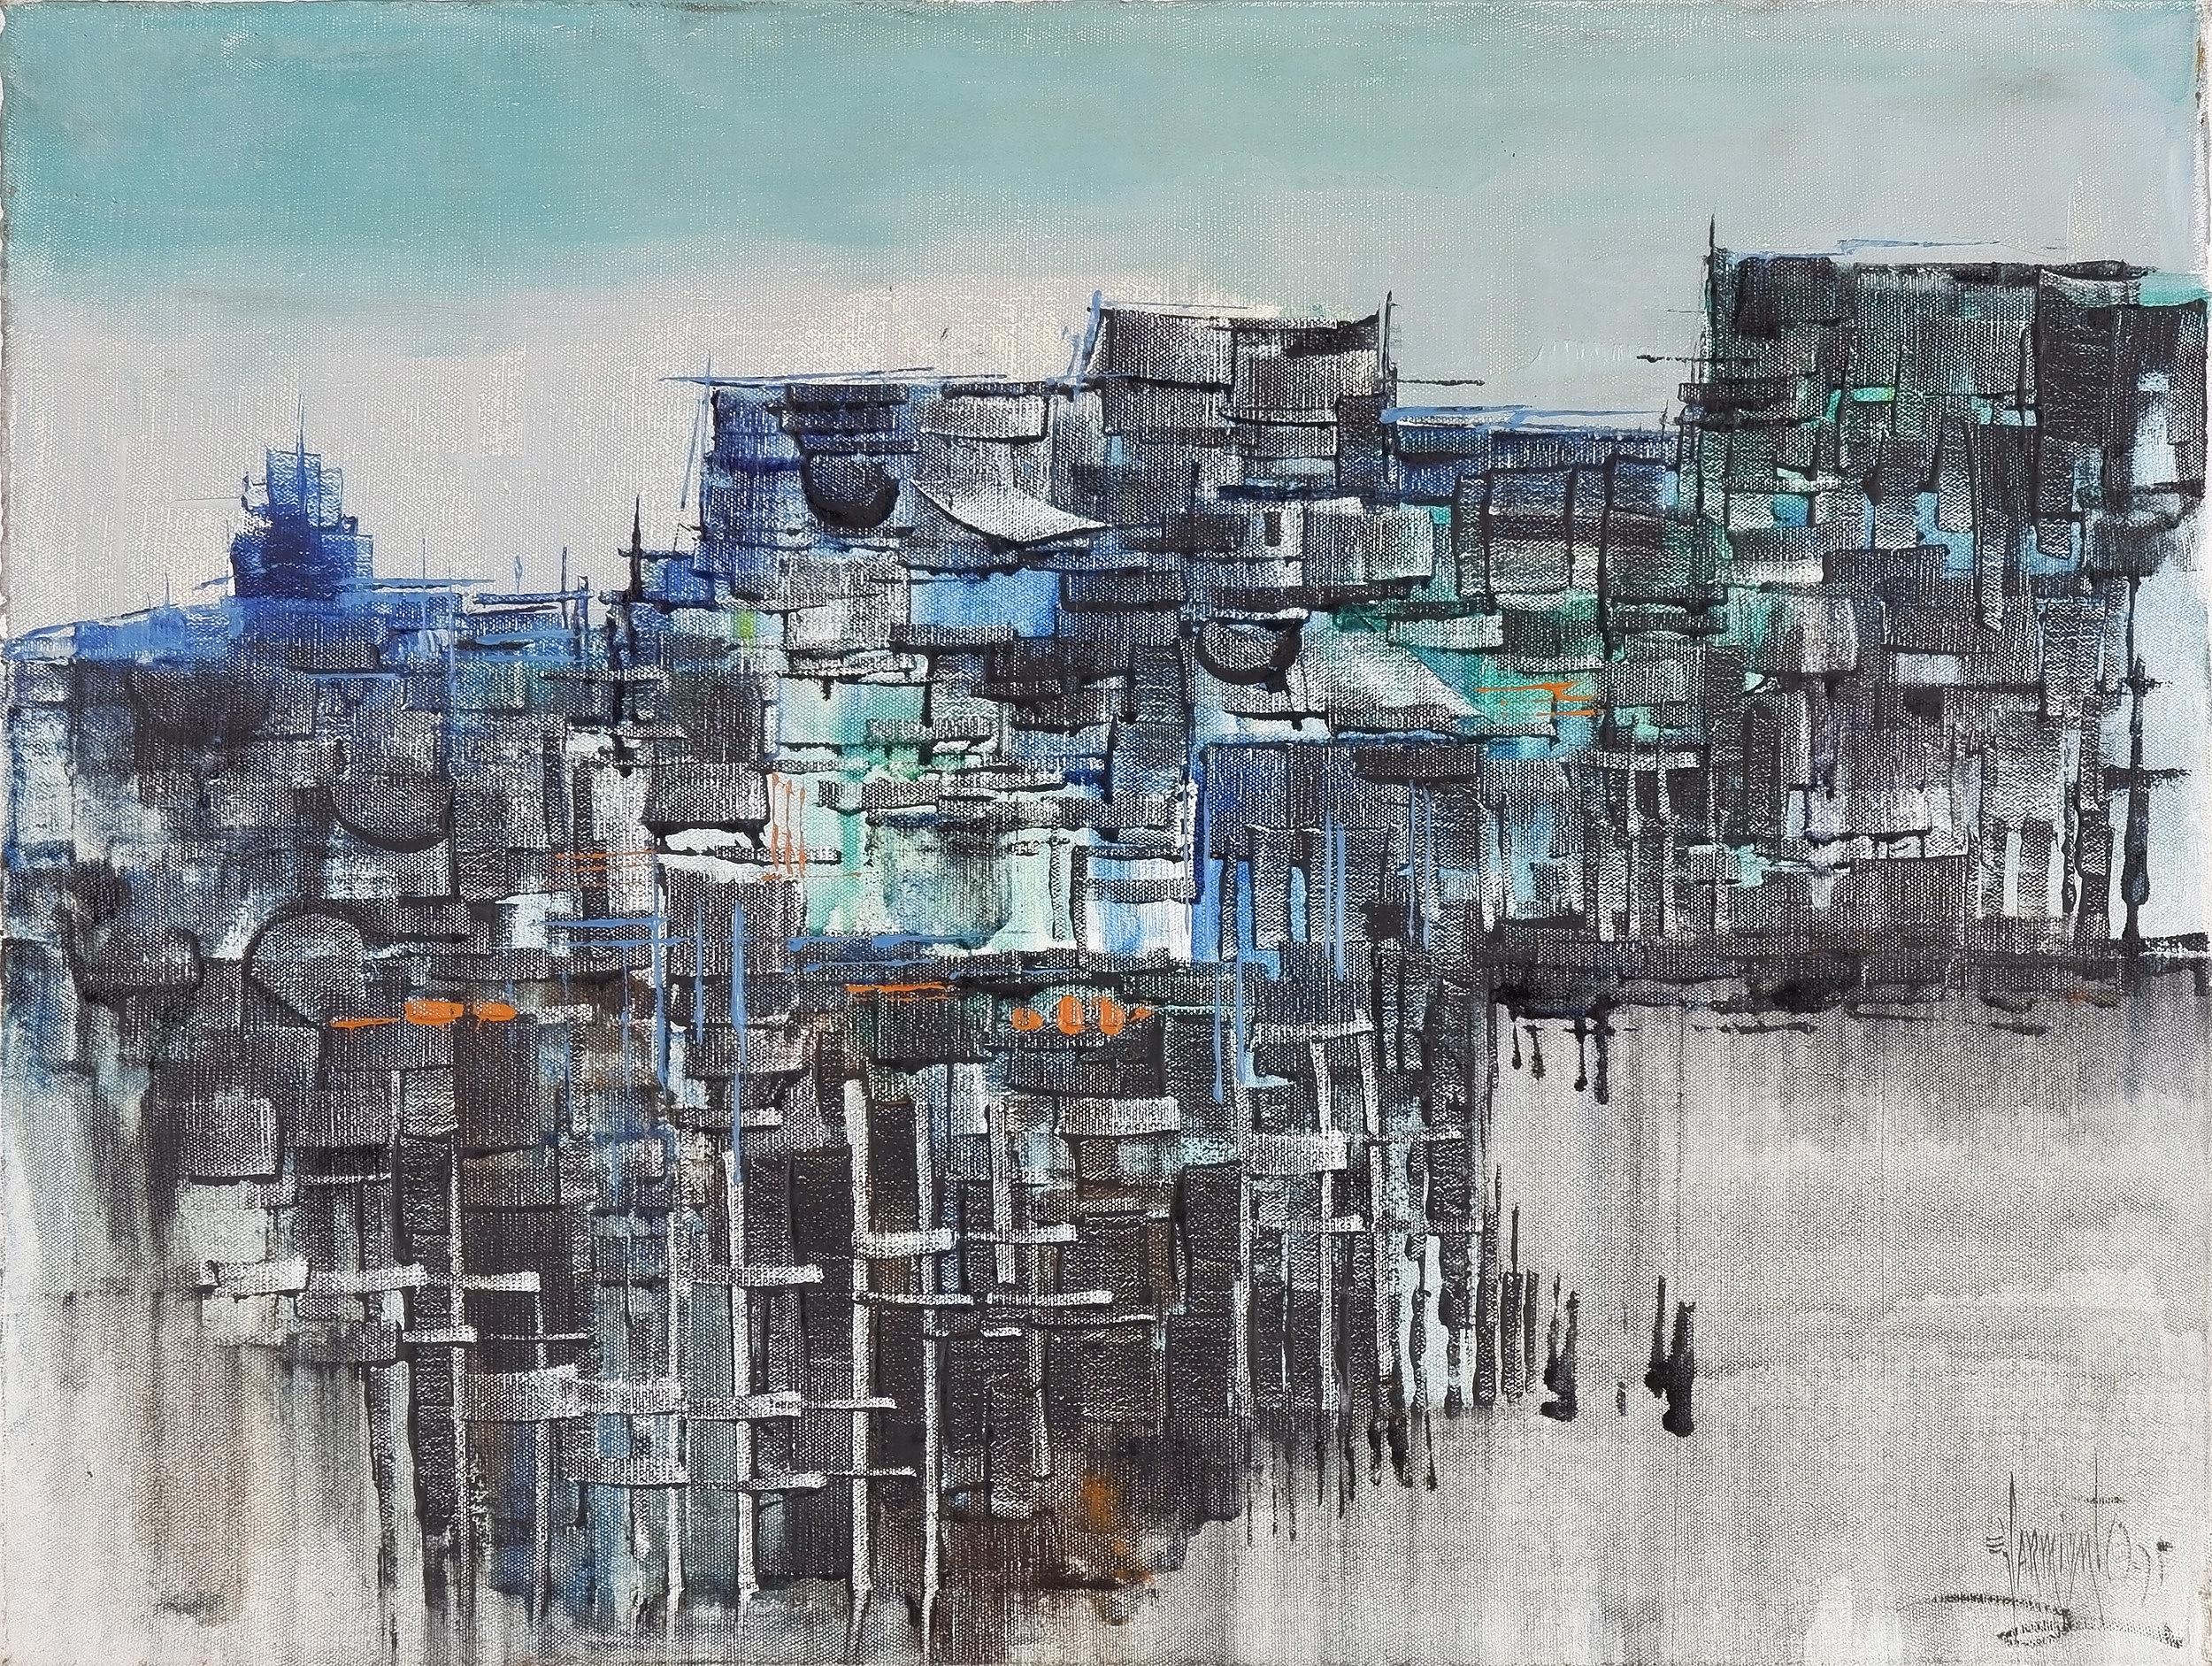 'Eddie Sarmiento (Philippines 1940-) Abstract Pole Village, Oil on Canvas'